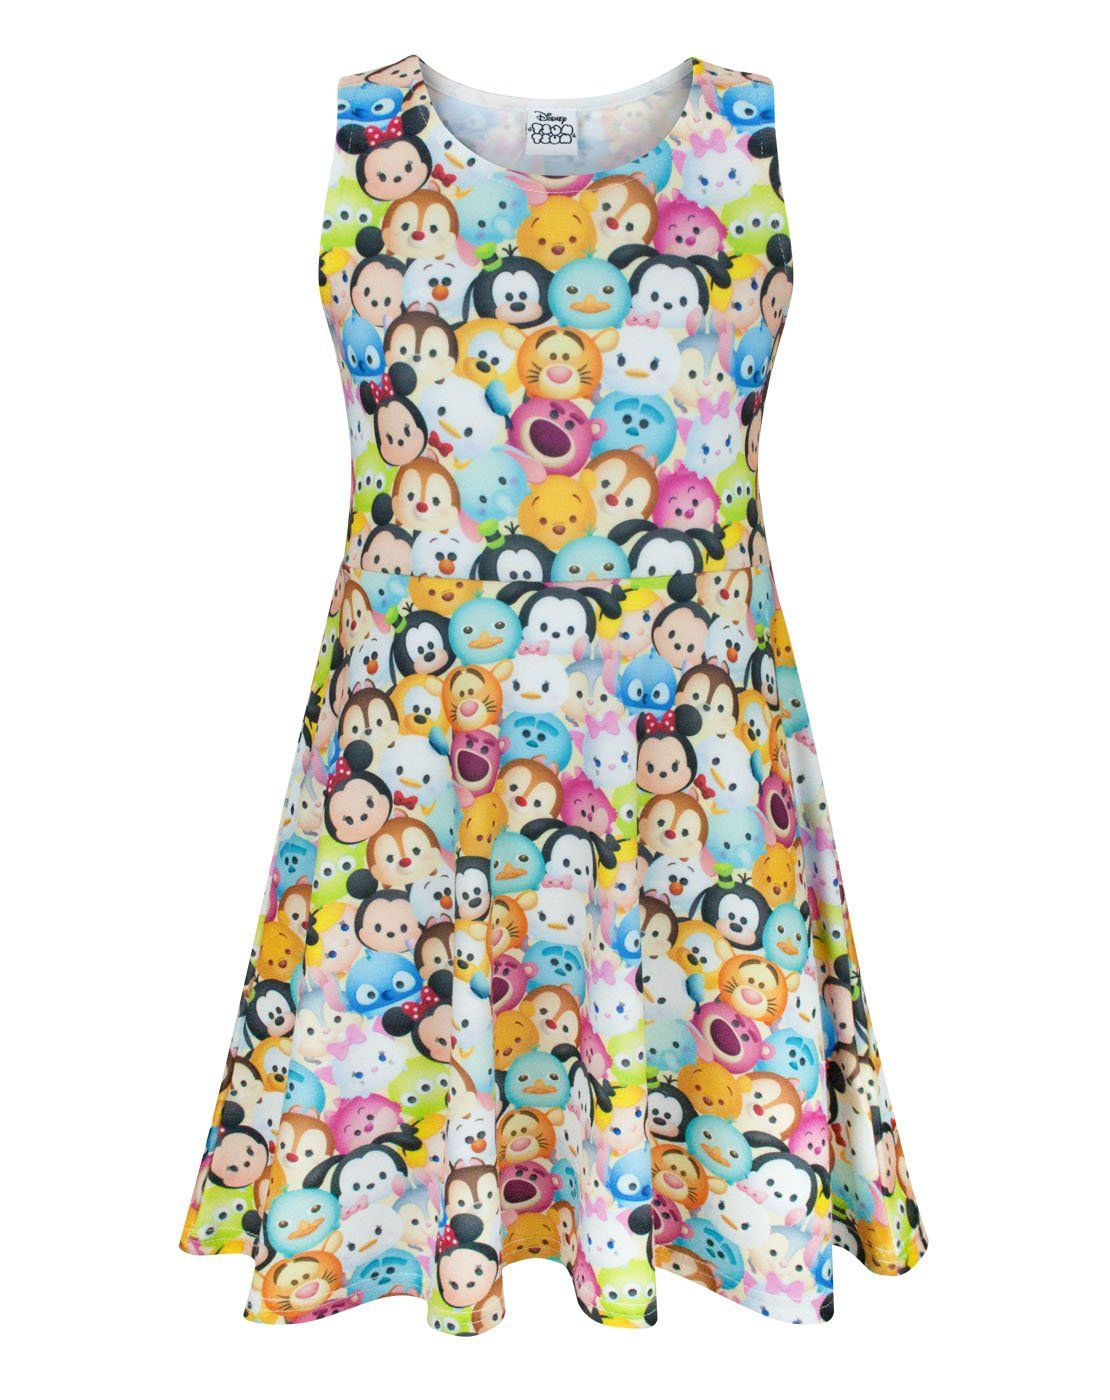 38b8f5657d Pin by Janet Chadwick on Disney Tsum Tsum Clothing